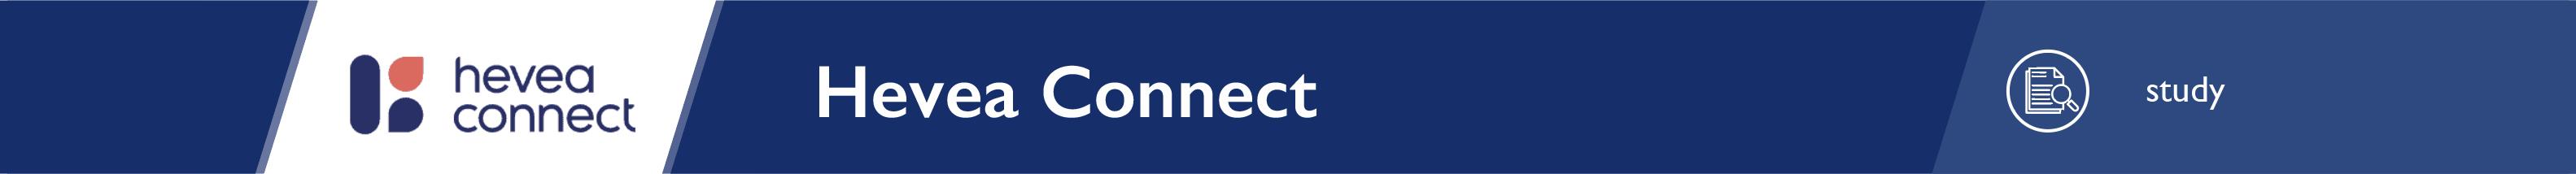 hevea-connect